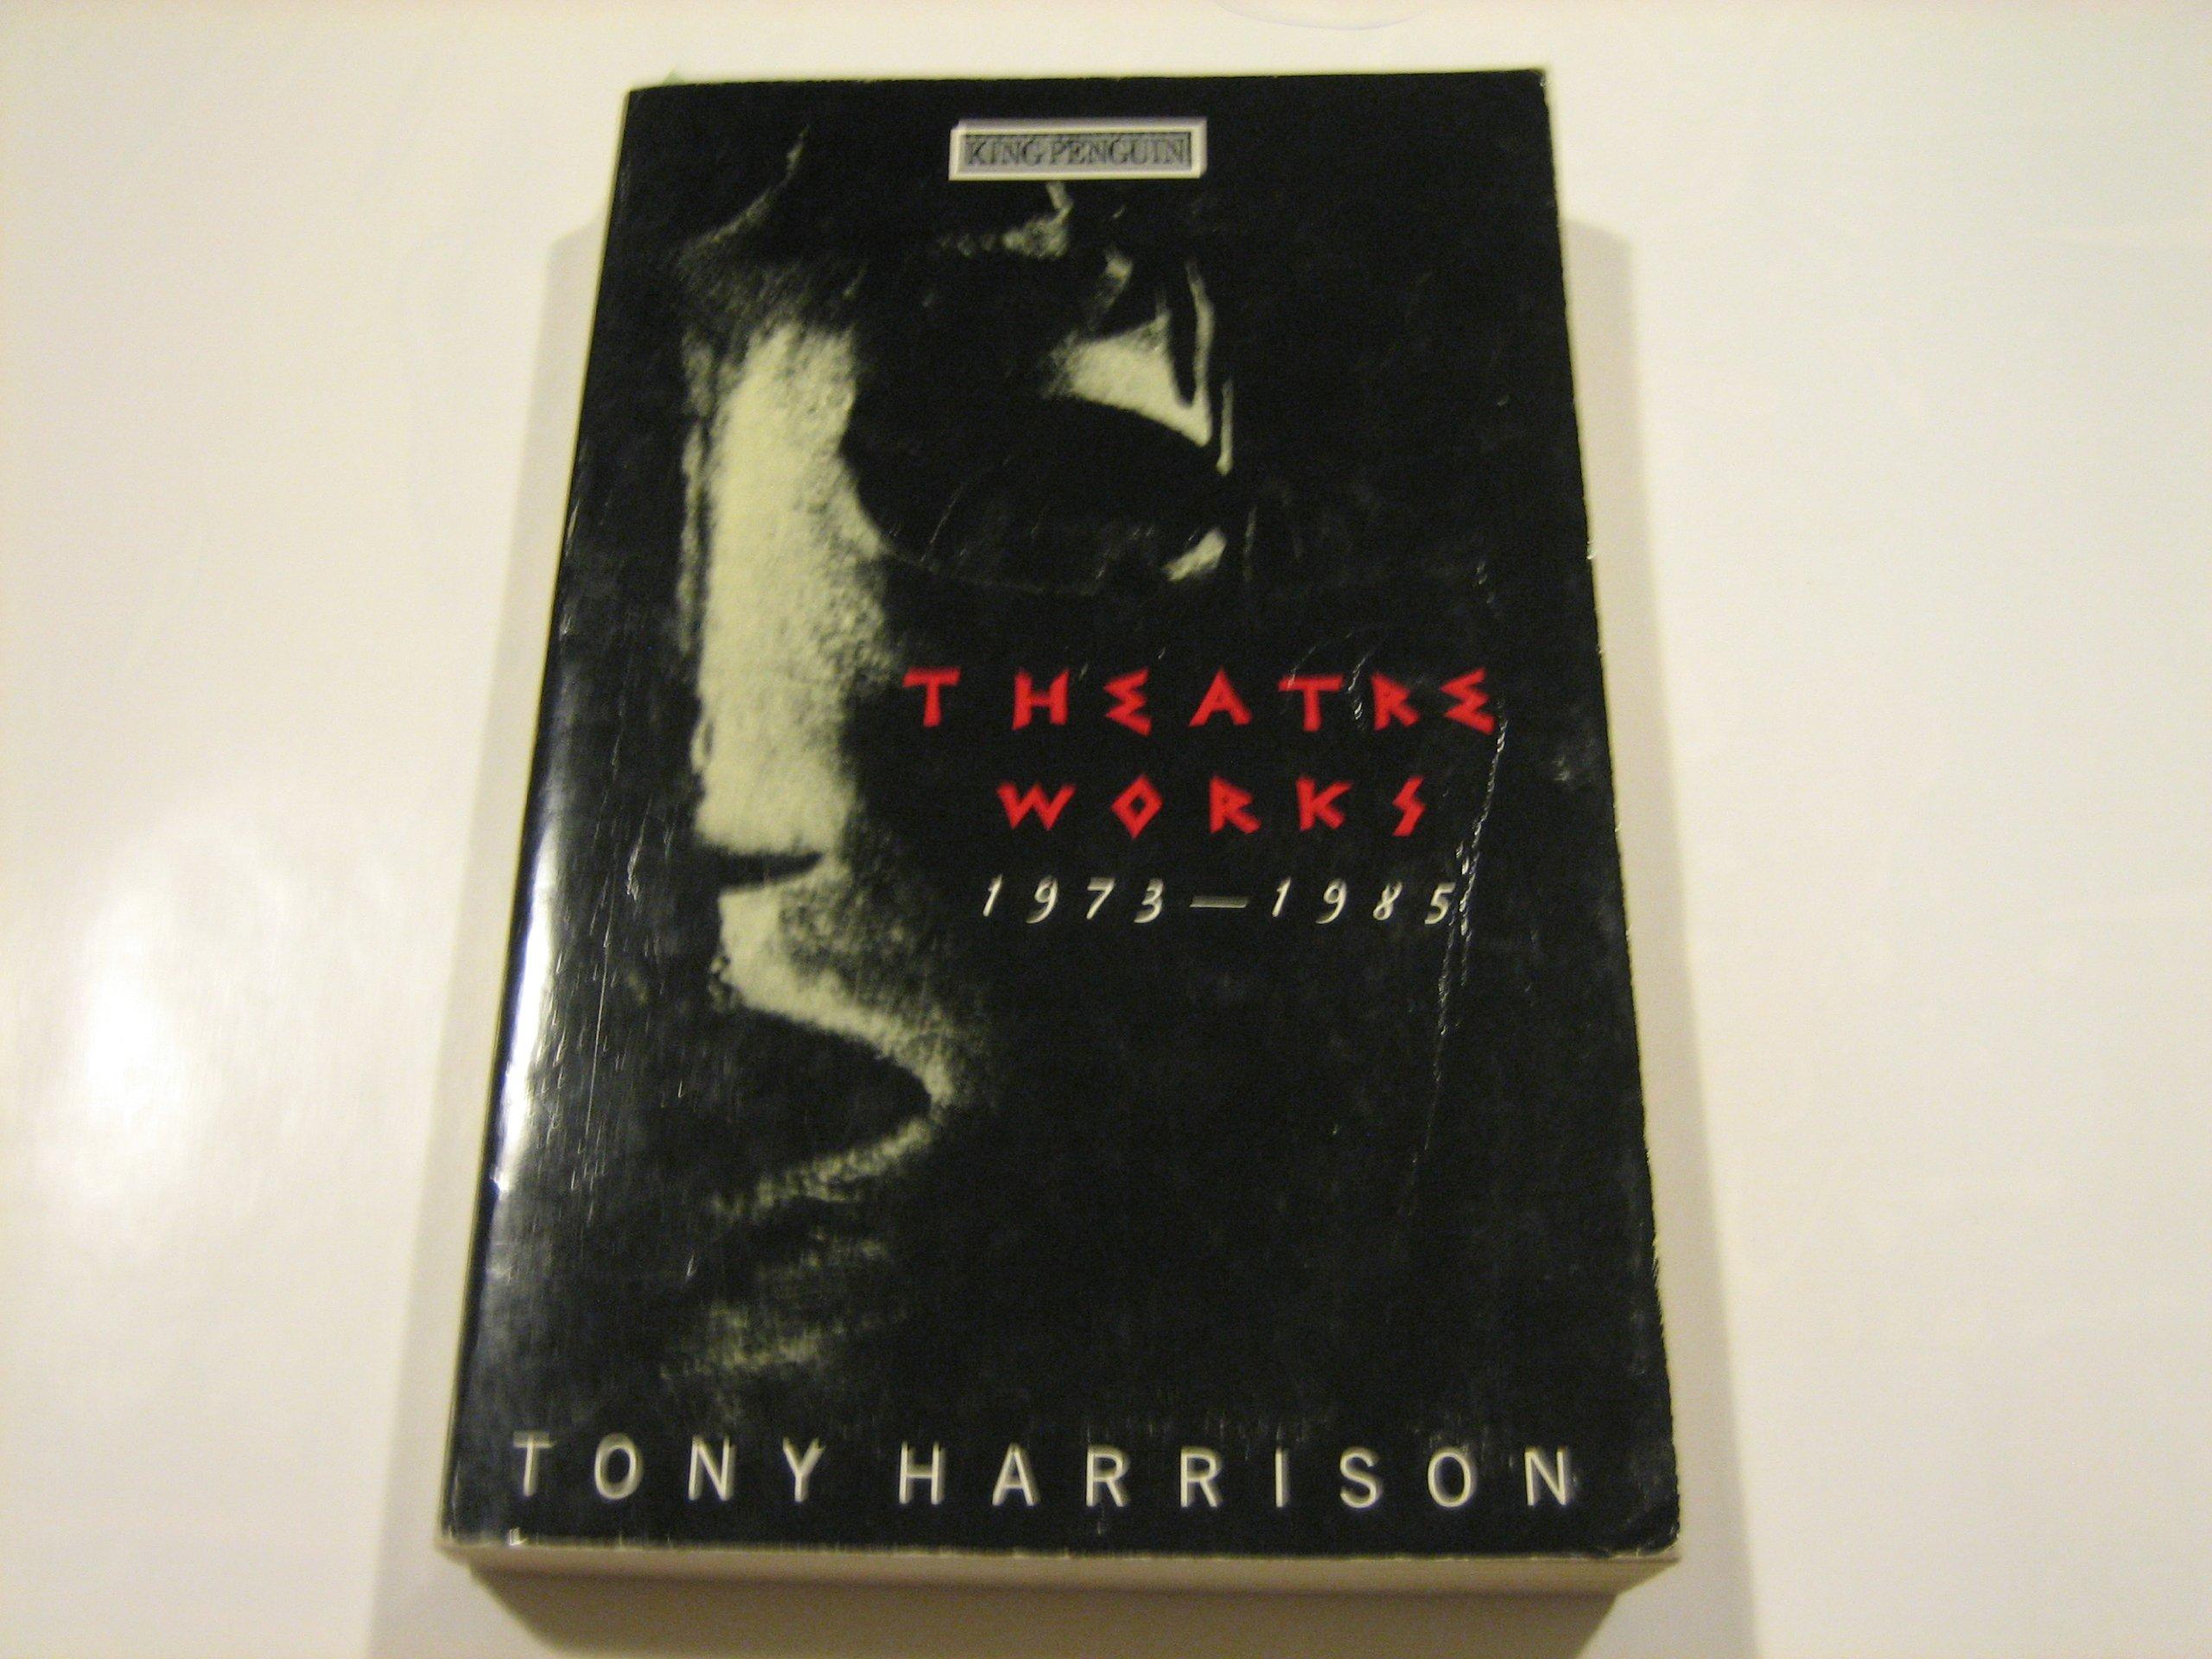 Theatre Works 1973 1985  The Misanthrope; Phaedra Britannica; Bowdown;the Bartered Bride;the Oresteia;Yan Tan Tethera;the Big H; Medea A Sex War Opera  King Penguin